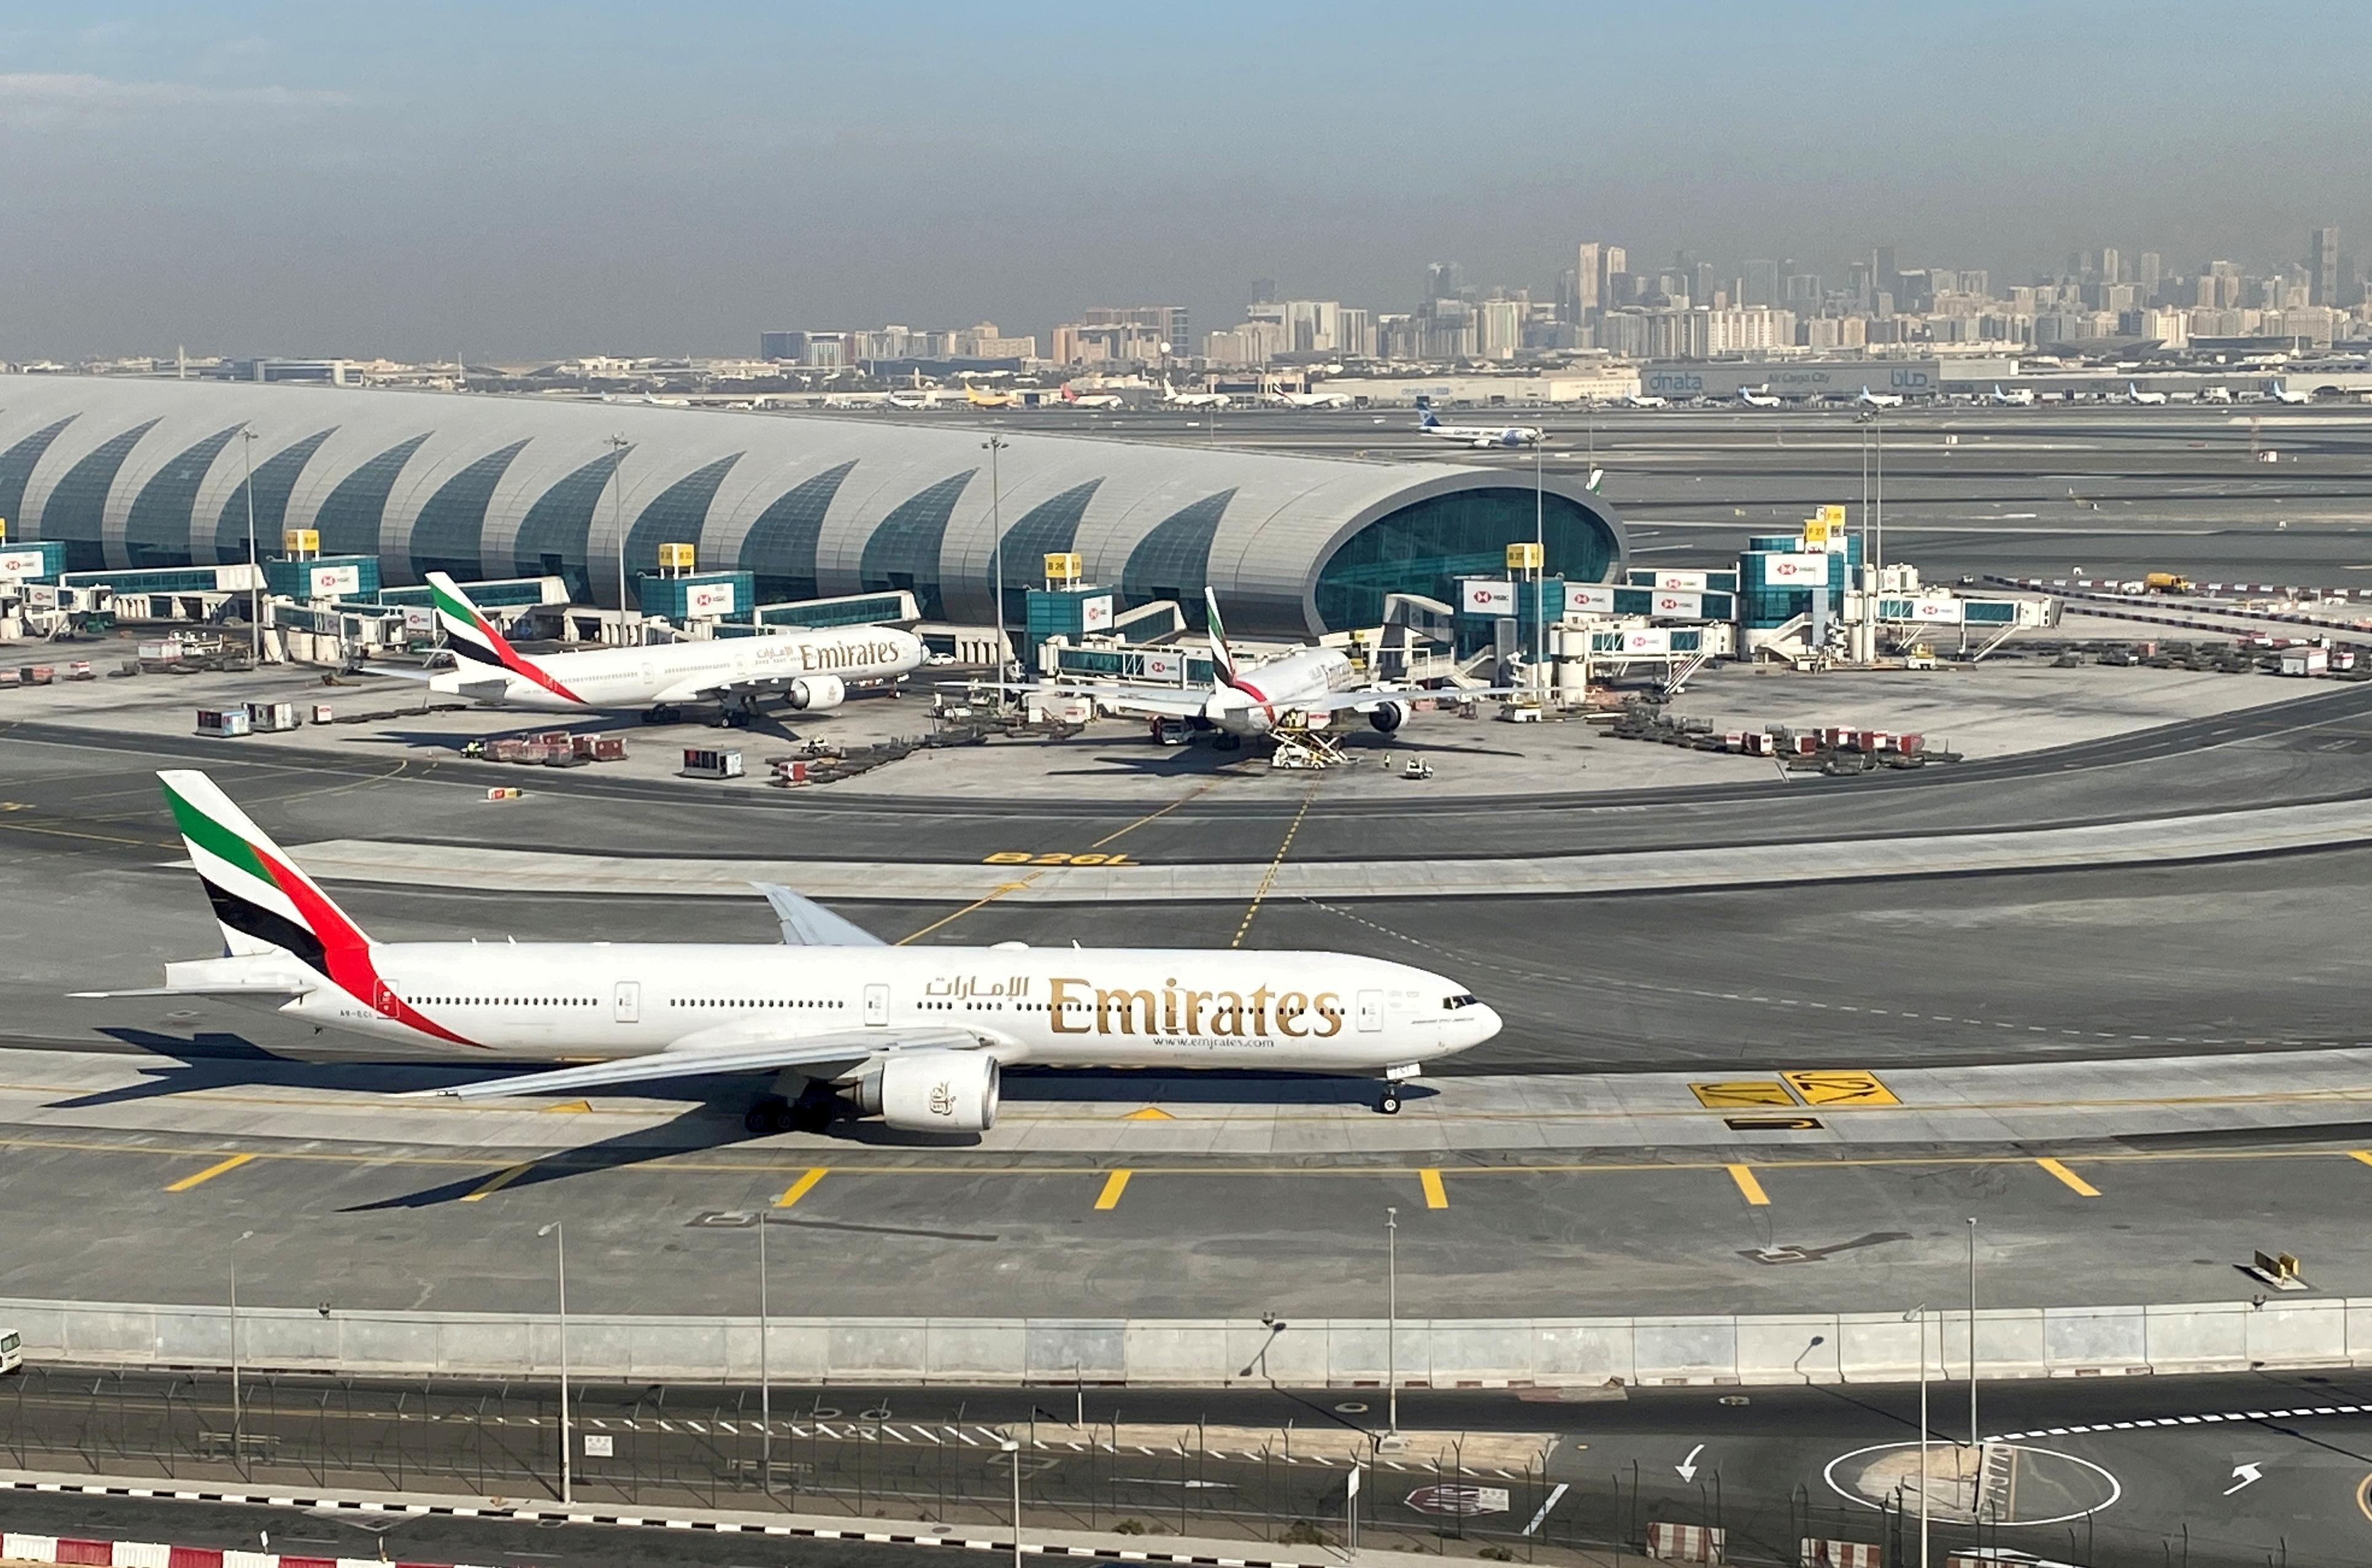 Emirates airliners are seen on the tarmac in a general view of Dubai International Airport in Dubai, United Arab Emirates January 13, 2021. REUTERS/Abdel Hadi Ramahi